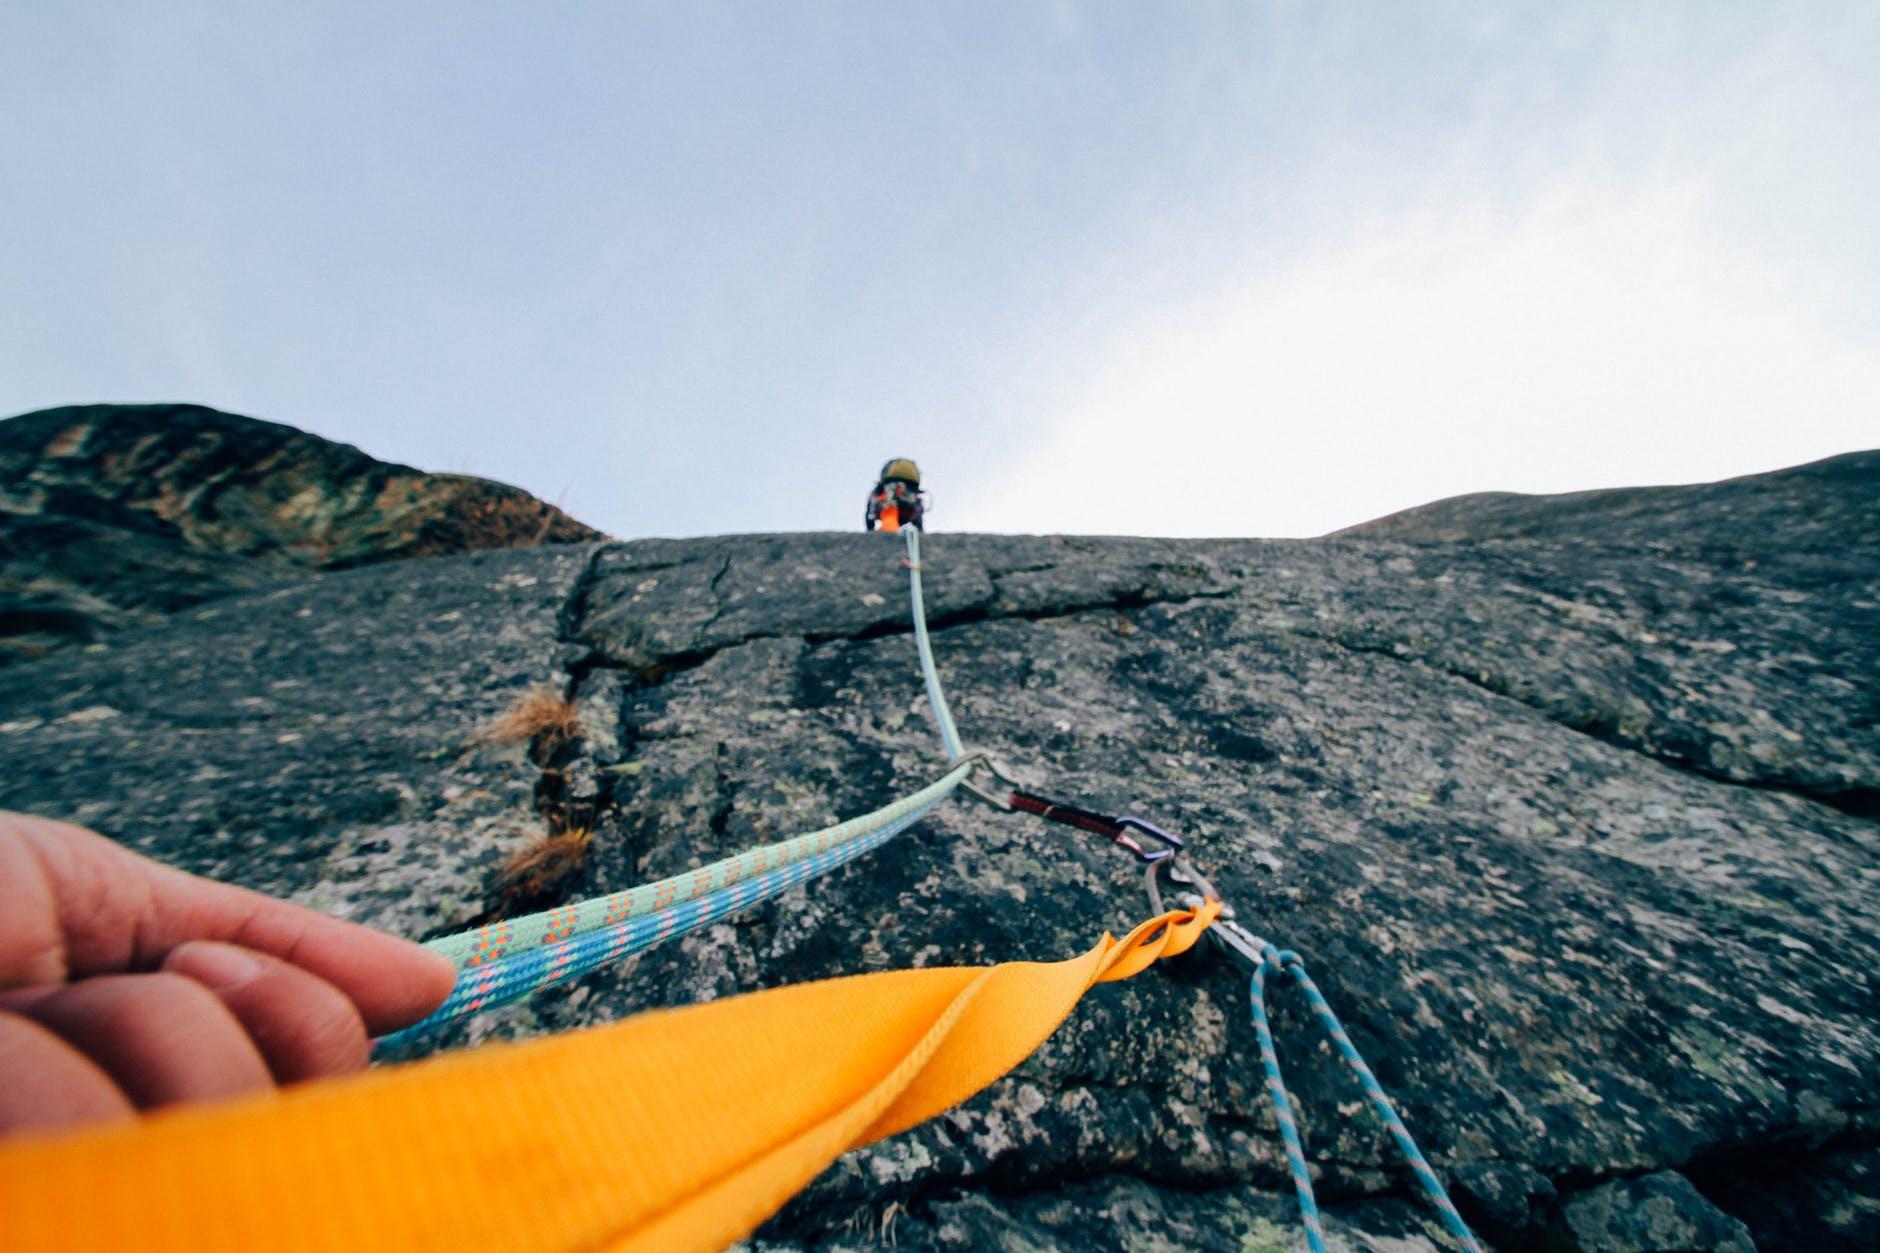 action adventure climbing daylight